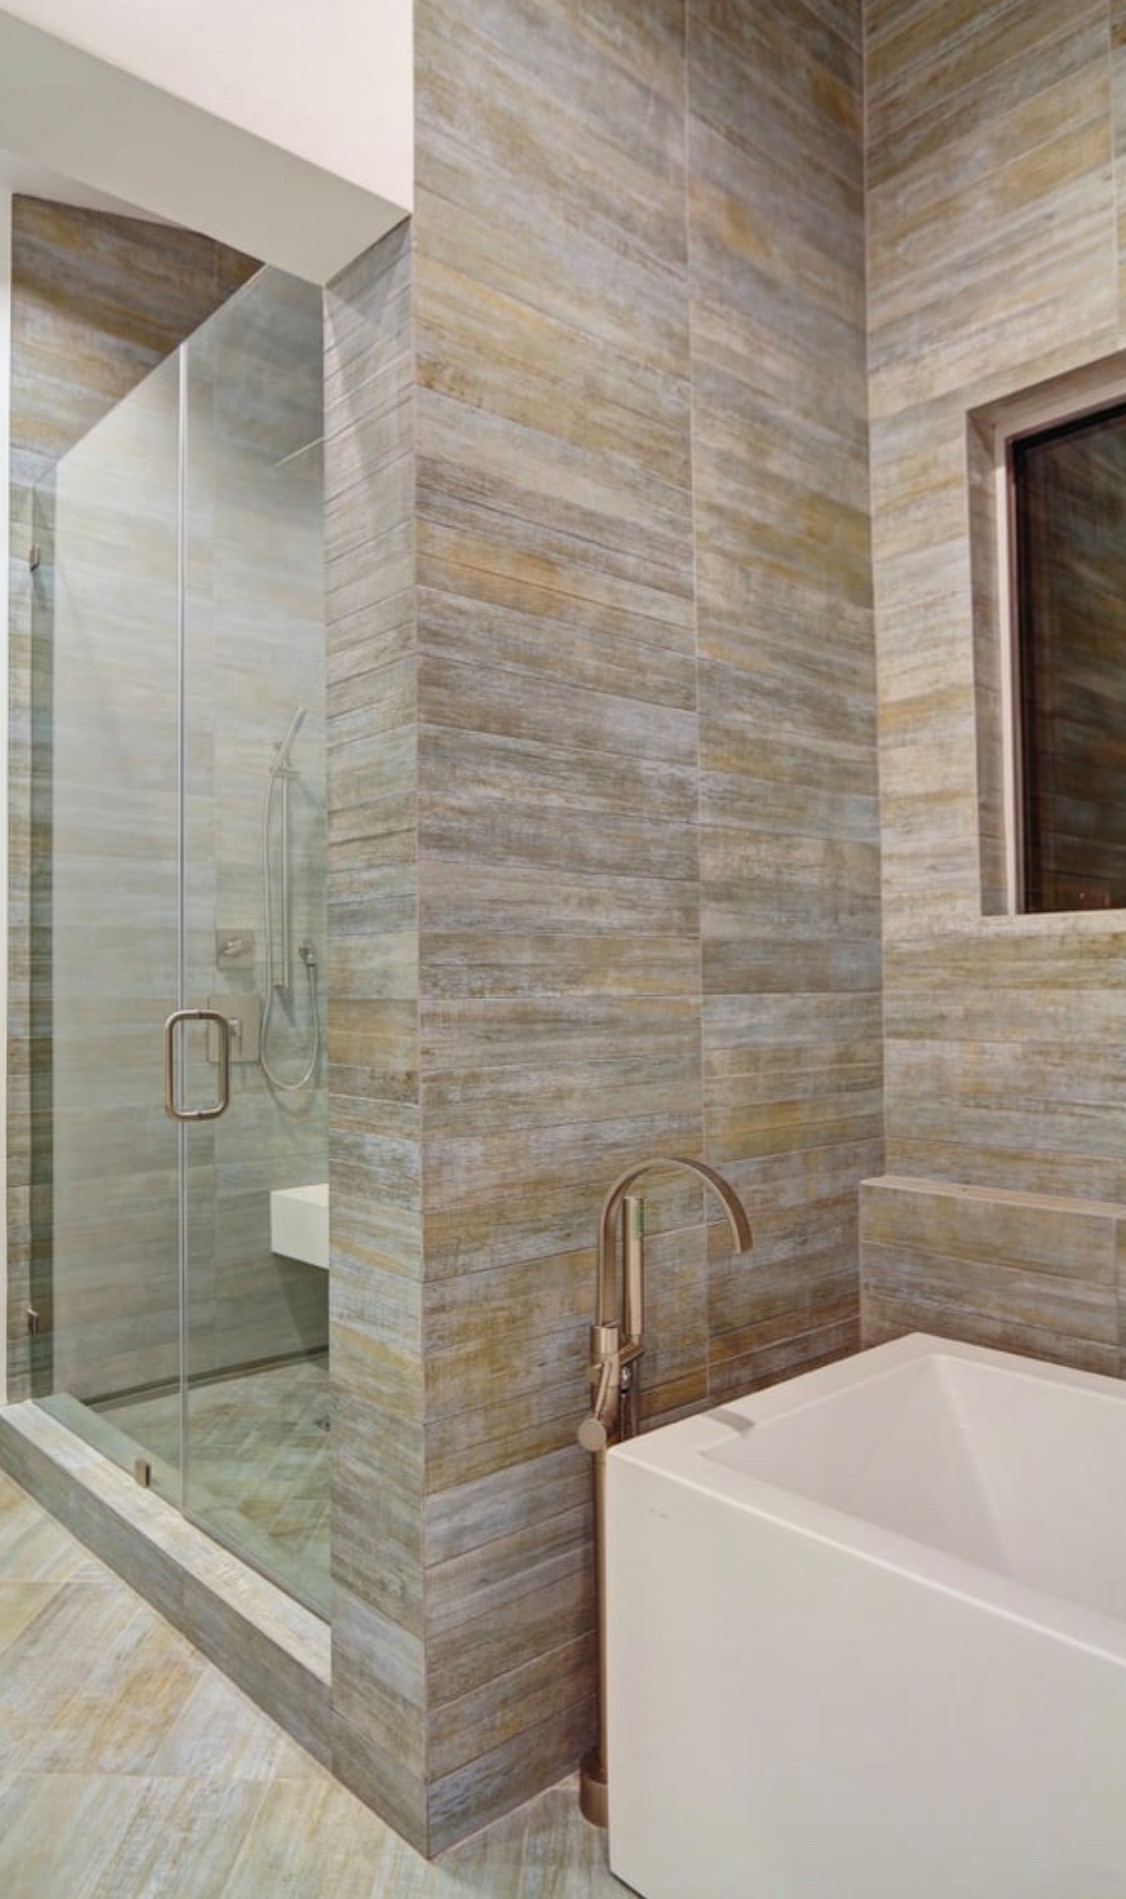 Bathroom remodel in Studio City